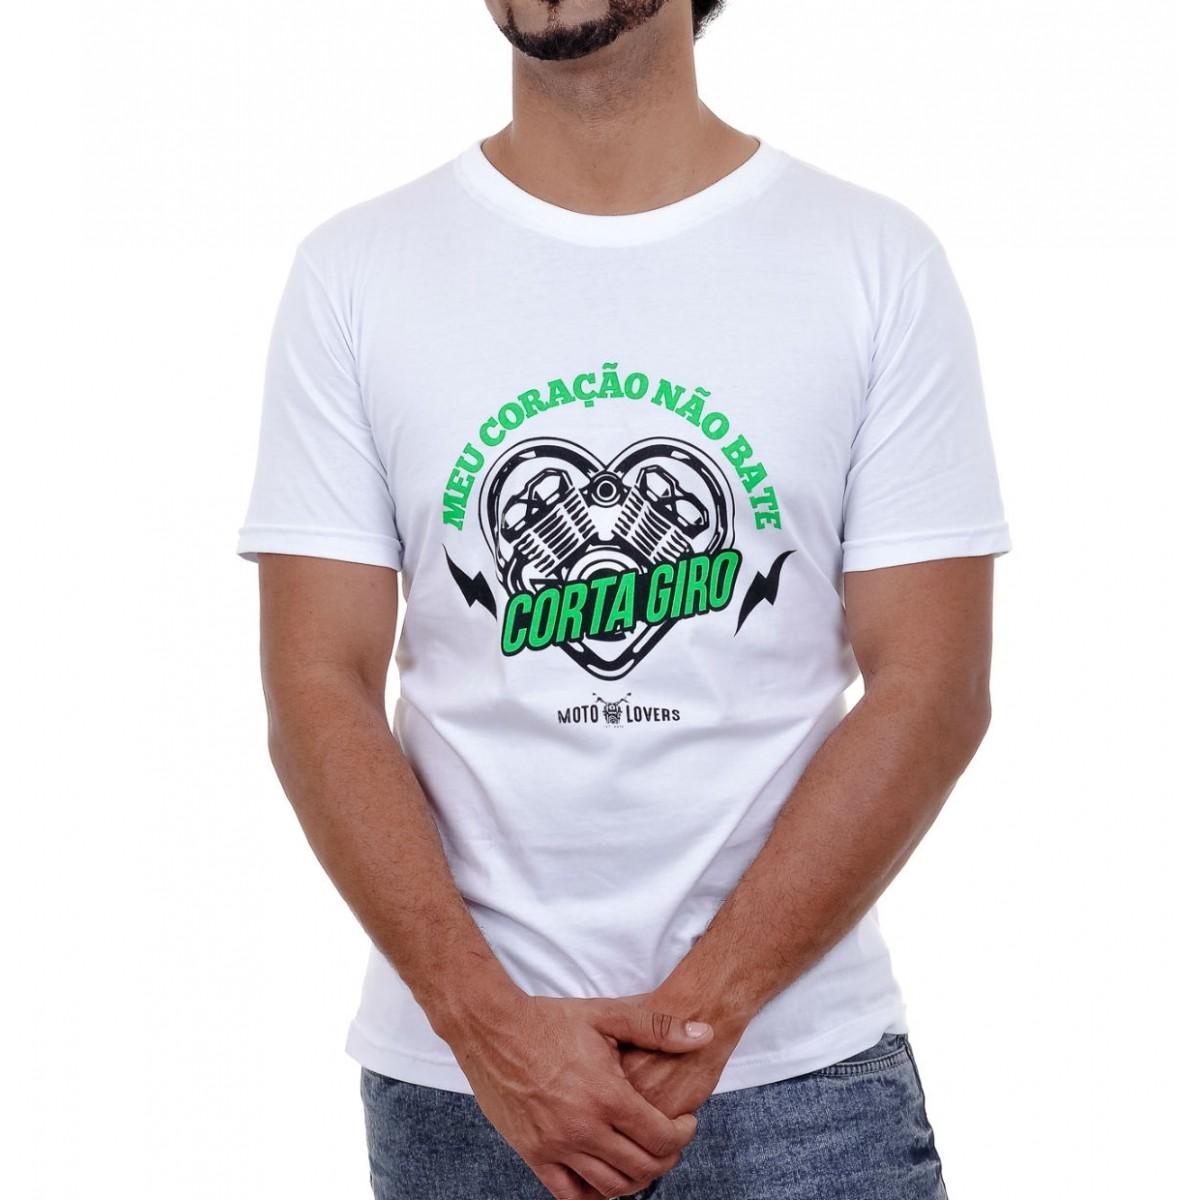 Camiseta Corta Giro - Branca